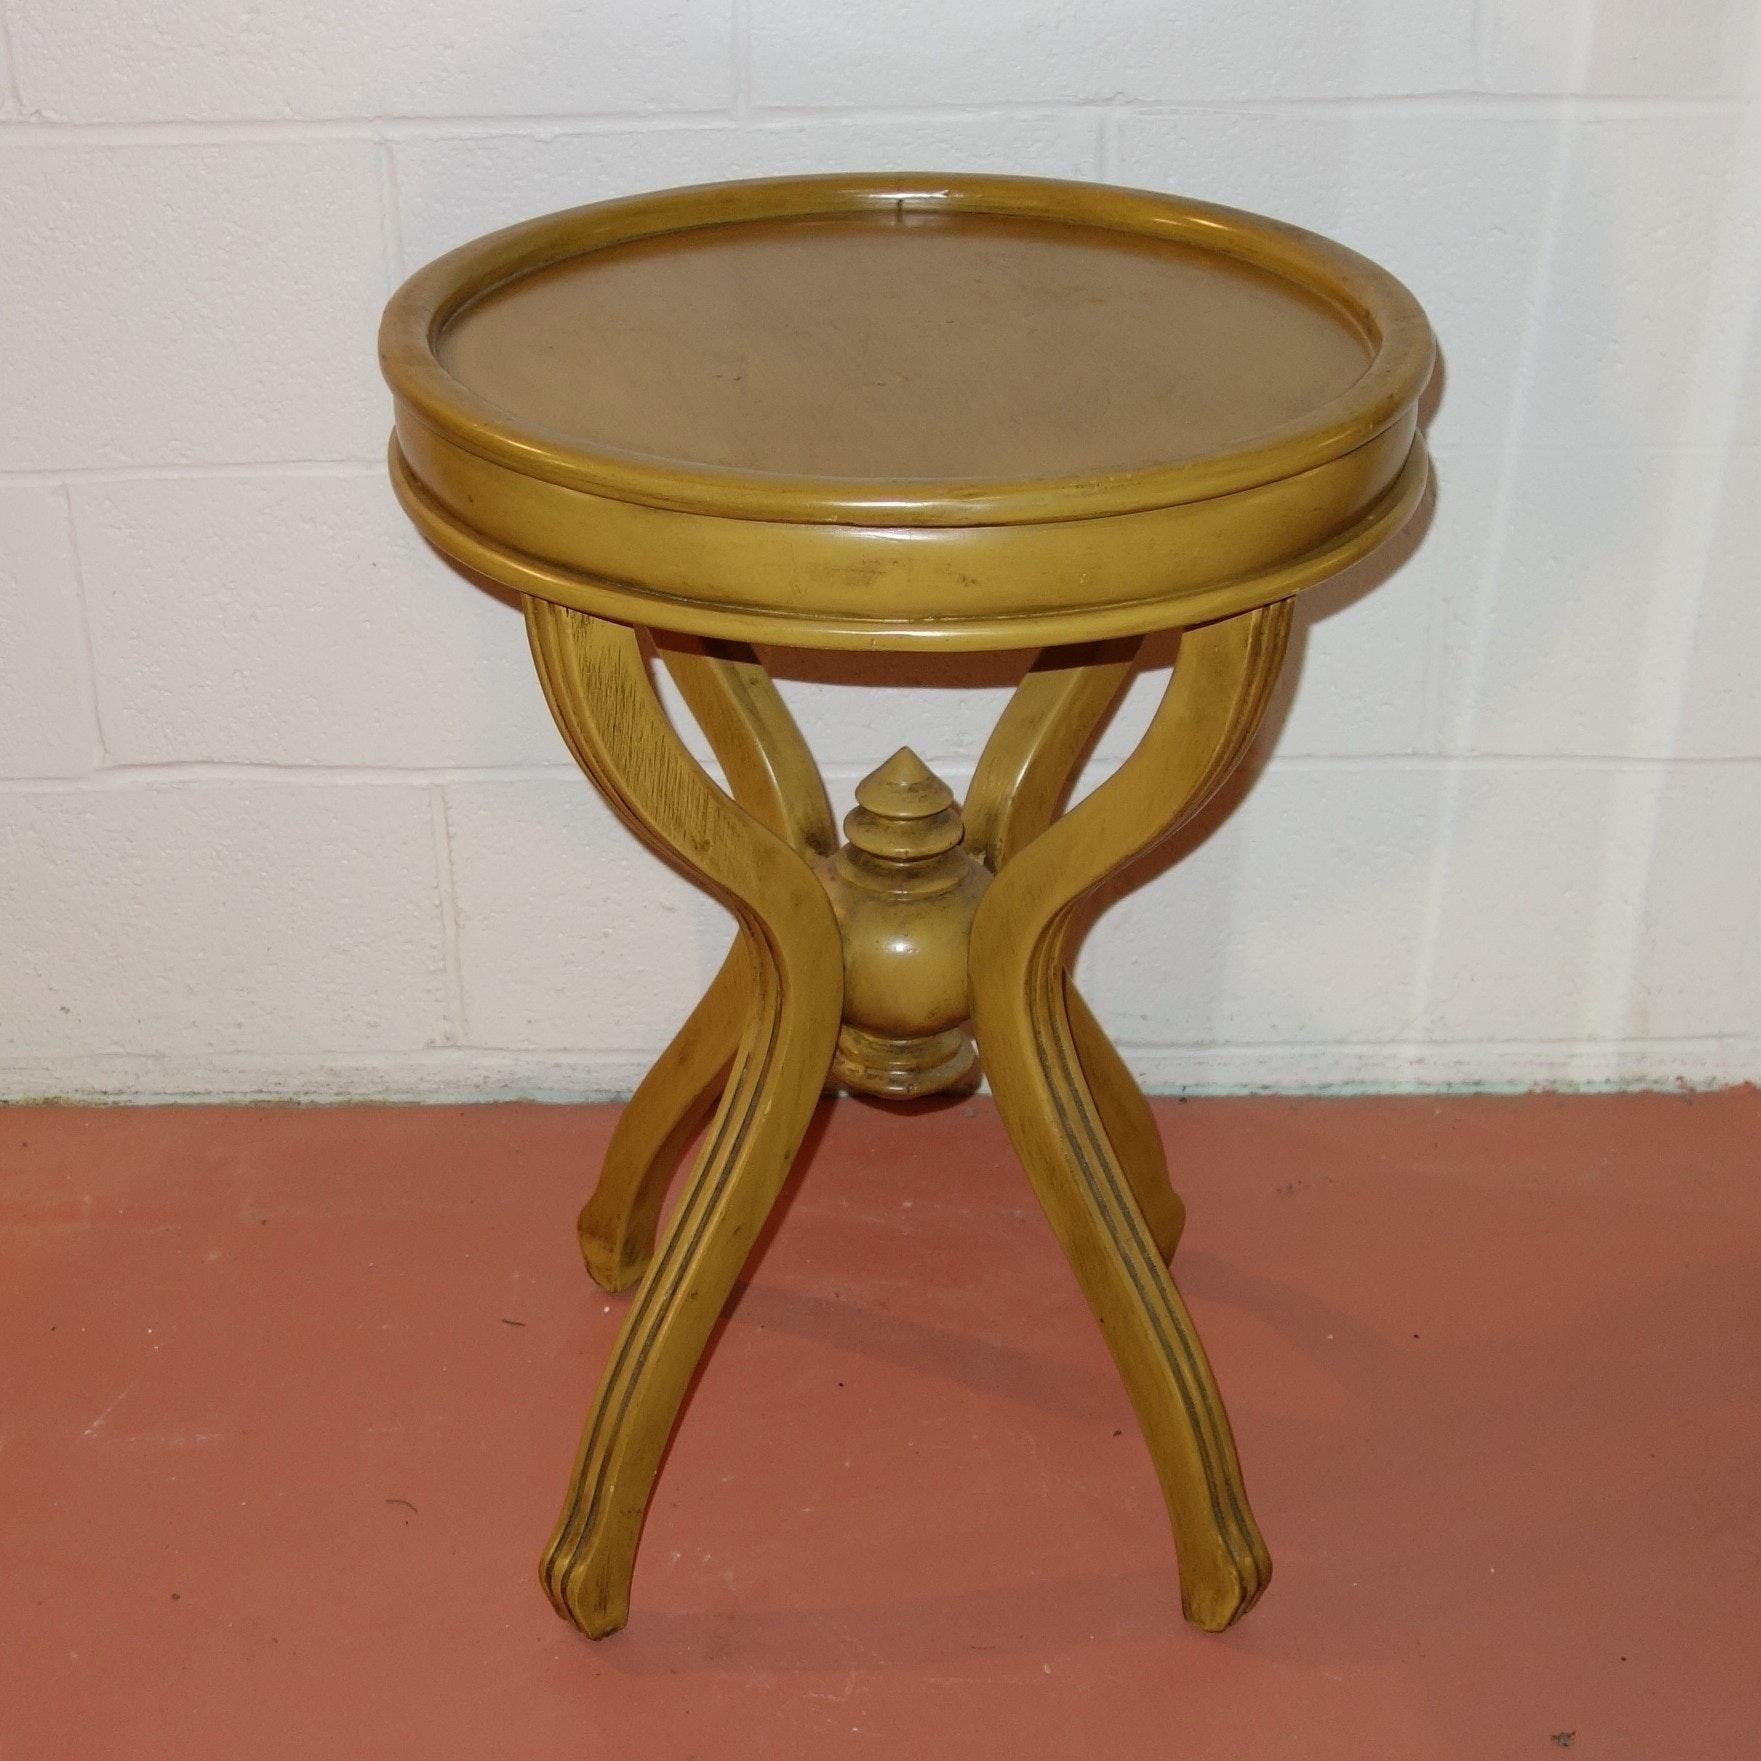 Vintage Round Side Table